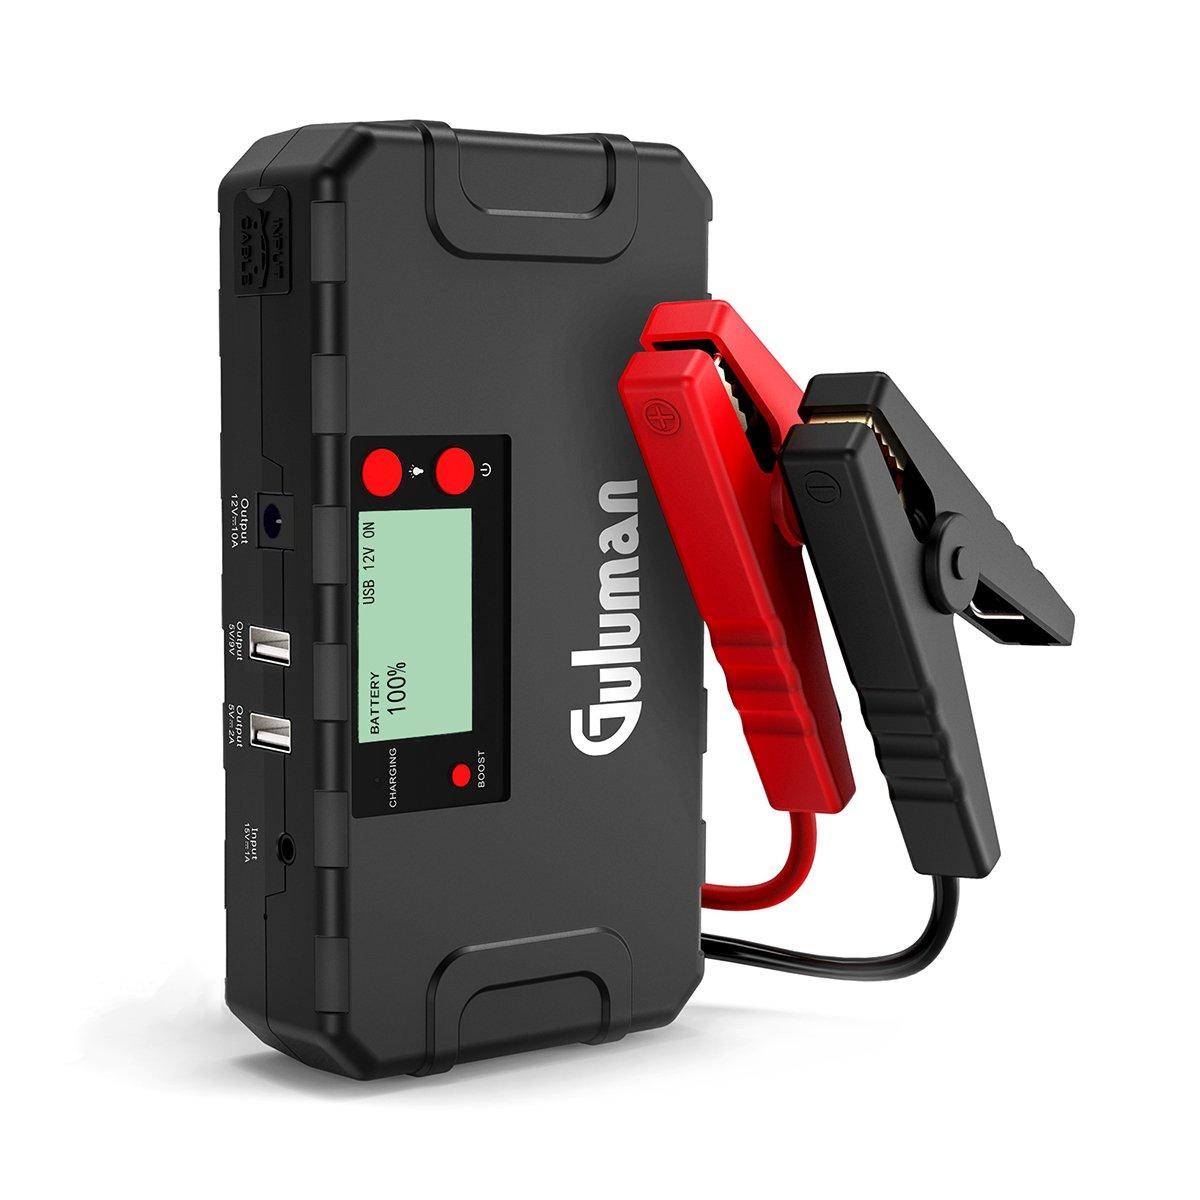 Guluman Auto Starthilfe 800A Peak 18000mAh Jump Starter Autobatterie Anlasser Externer Akku Ladegerä t mit LCD Display und LED Taschenlampe